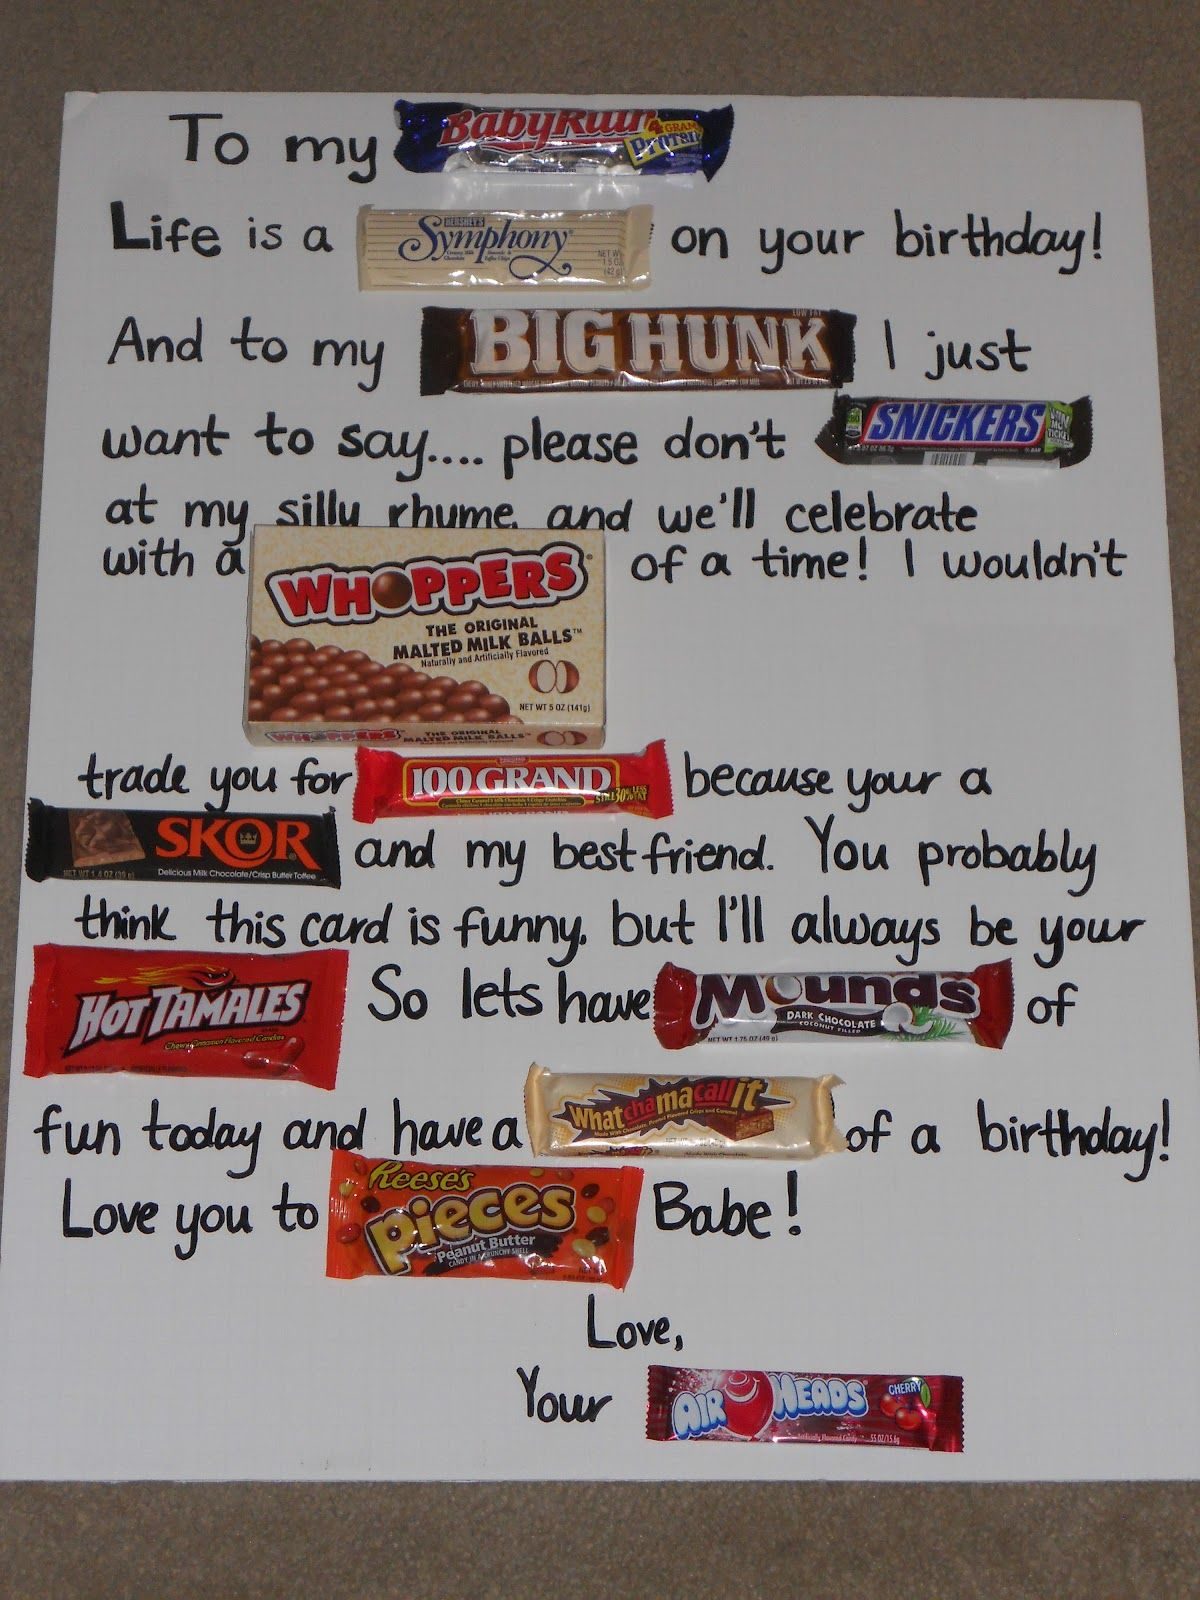 Candy bar poem birthday card/poster for someones birthday ...